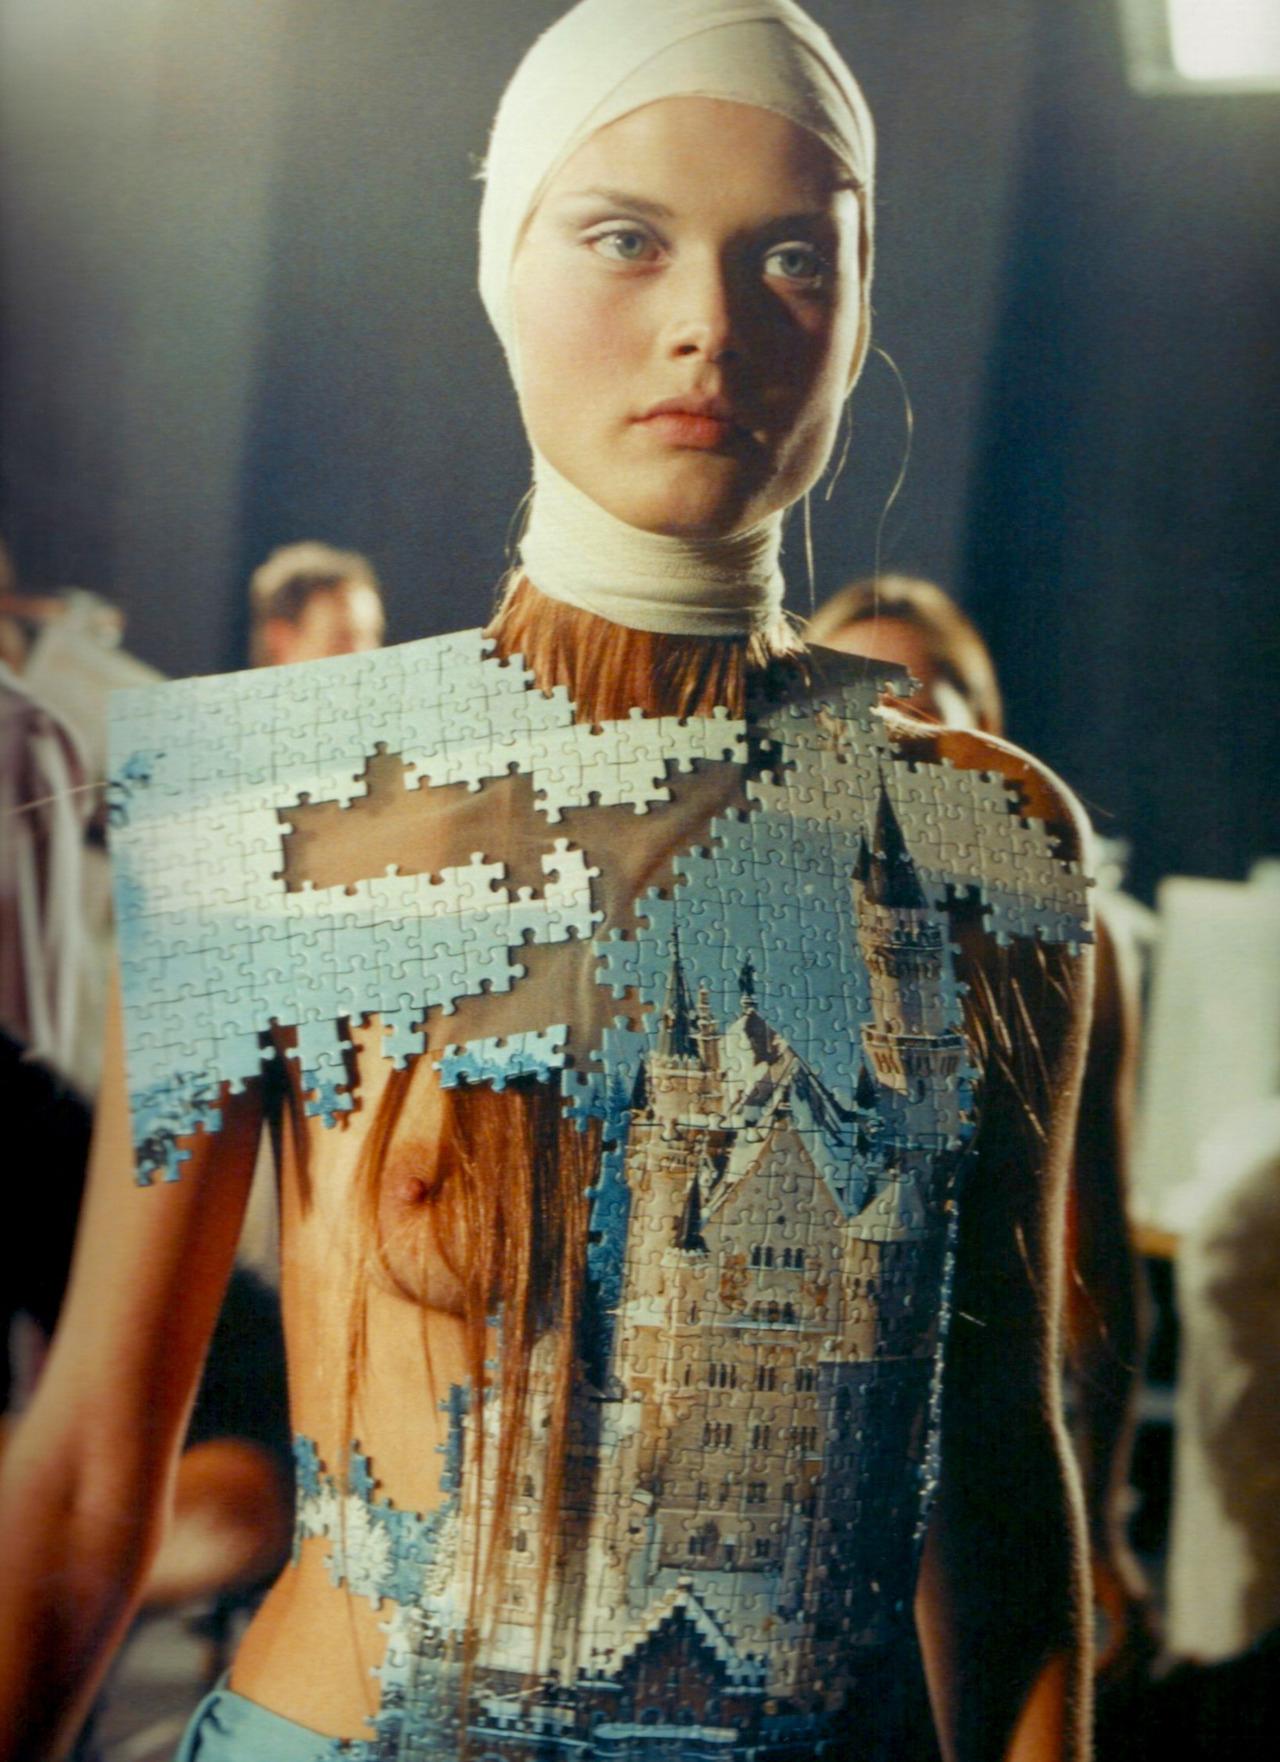 Alexander_McQueen-Spring_Summer-2001-baby-lets-get-lost.jpg